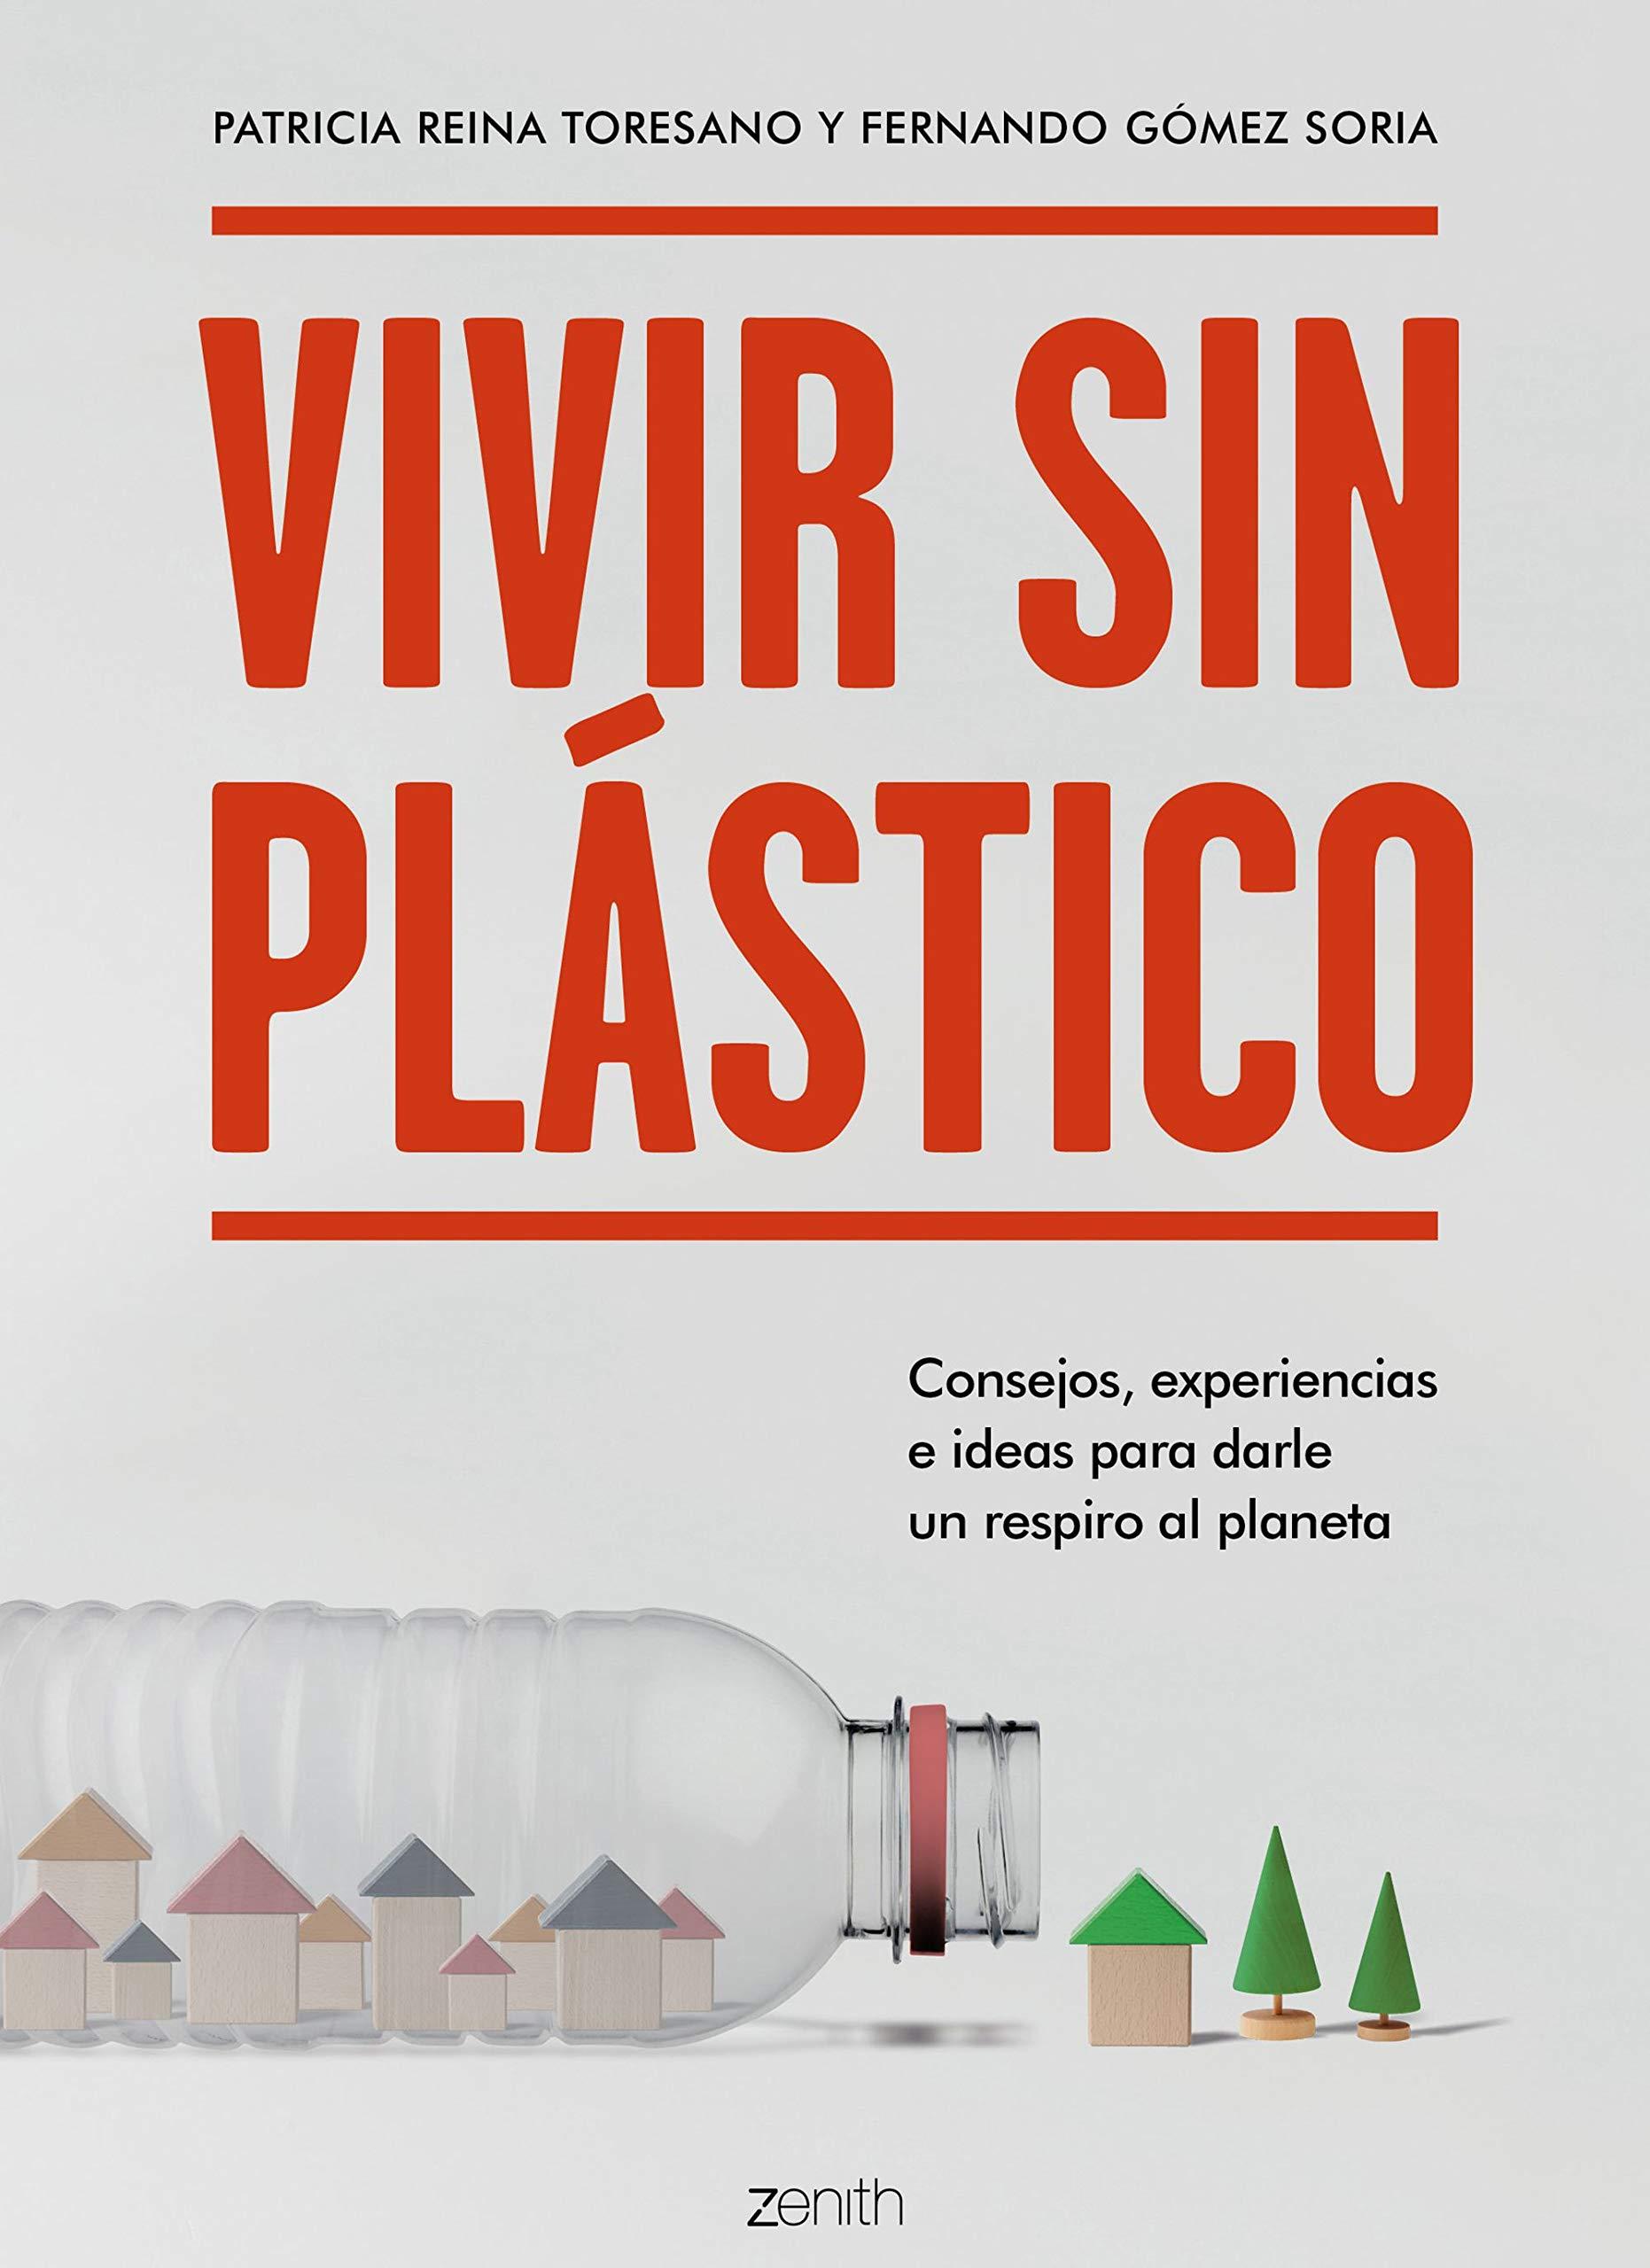 Vivir sin plástico: Consejos, experiencias e ideas para darle un respiro al planeta